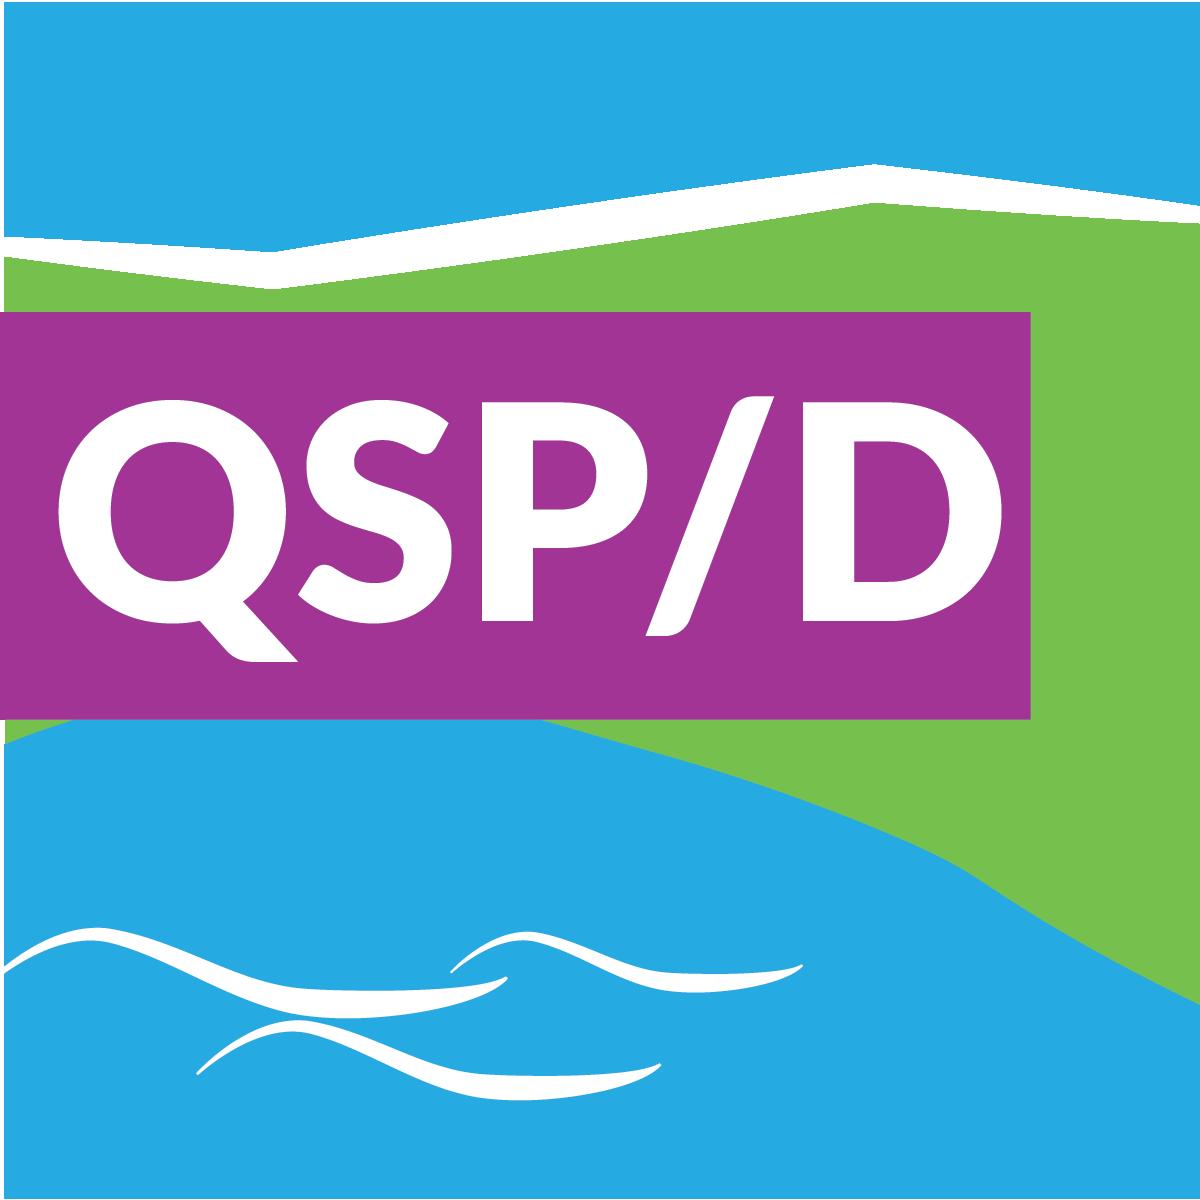 Qualified Stormwater Practitioner / Developer (QSP/D) training